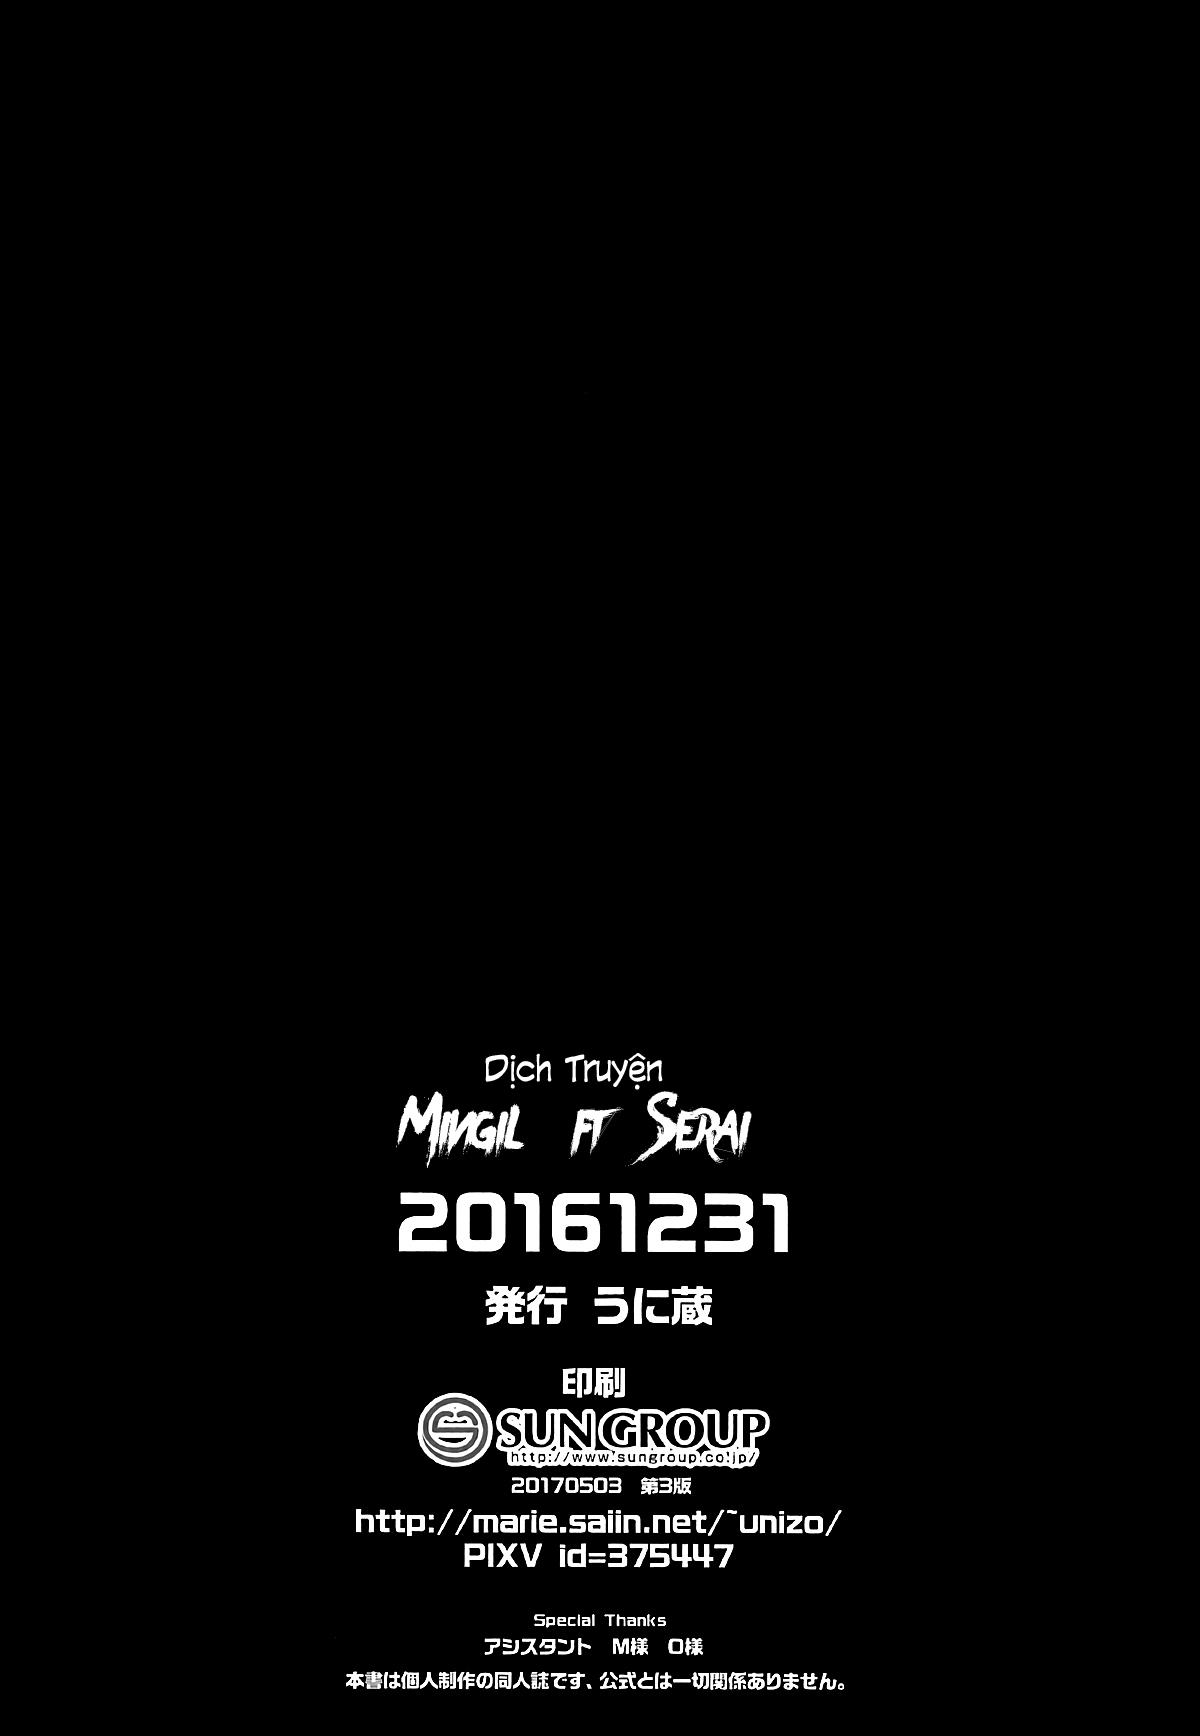 HentaiVN.net - Ảnh 23 - Chimimouryou Kikikaikai (Fate/Grand Order) [Việt Sub] - [うに蔵 (うに蔵)] 痴魅妄陵嬉々快界 (Fate/Grand Order) - Oneshot